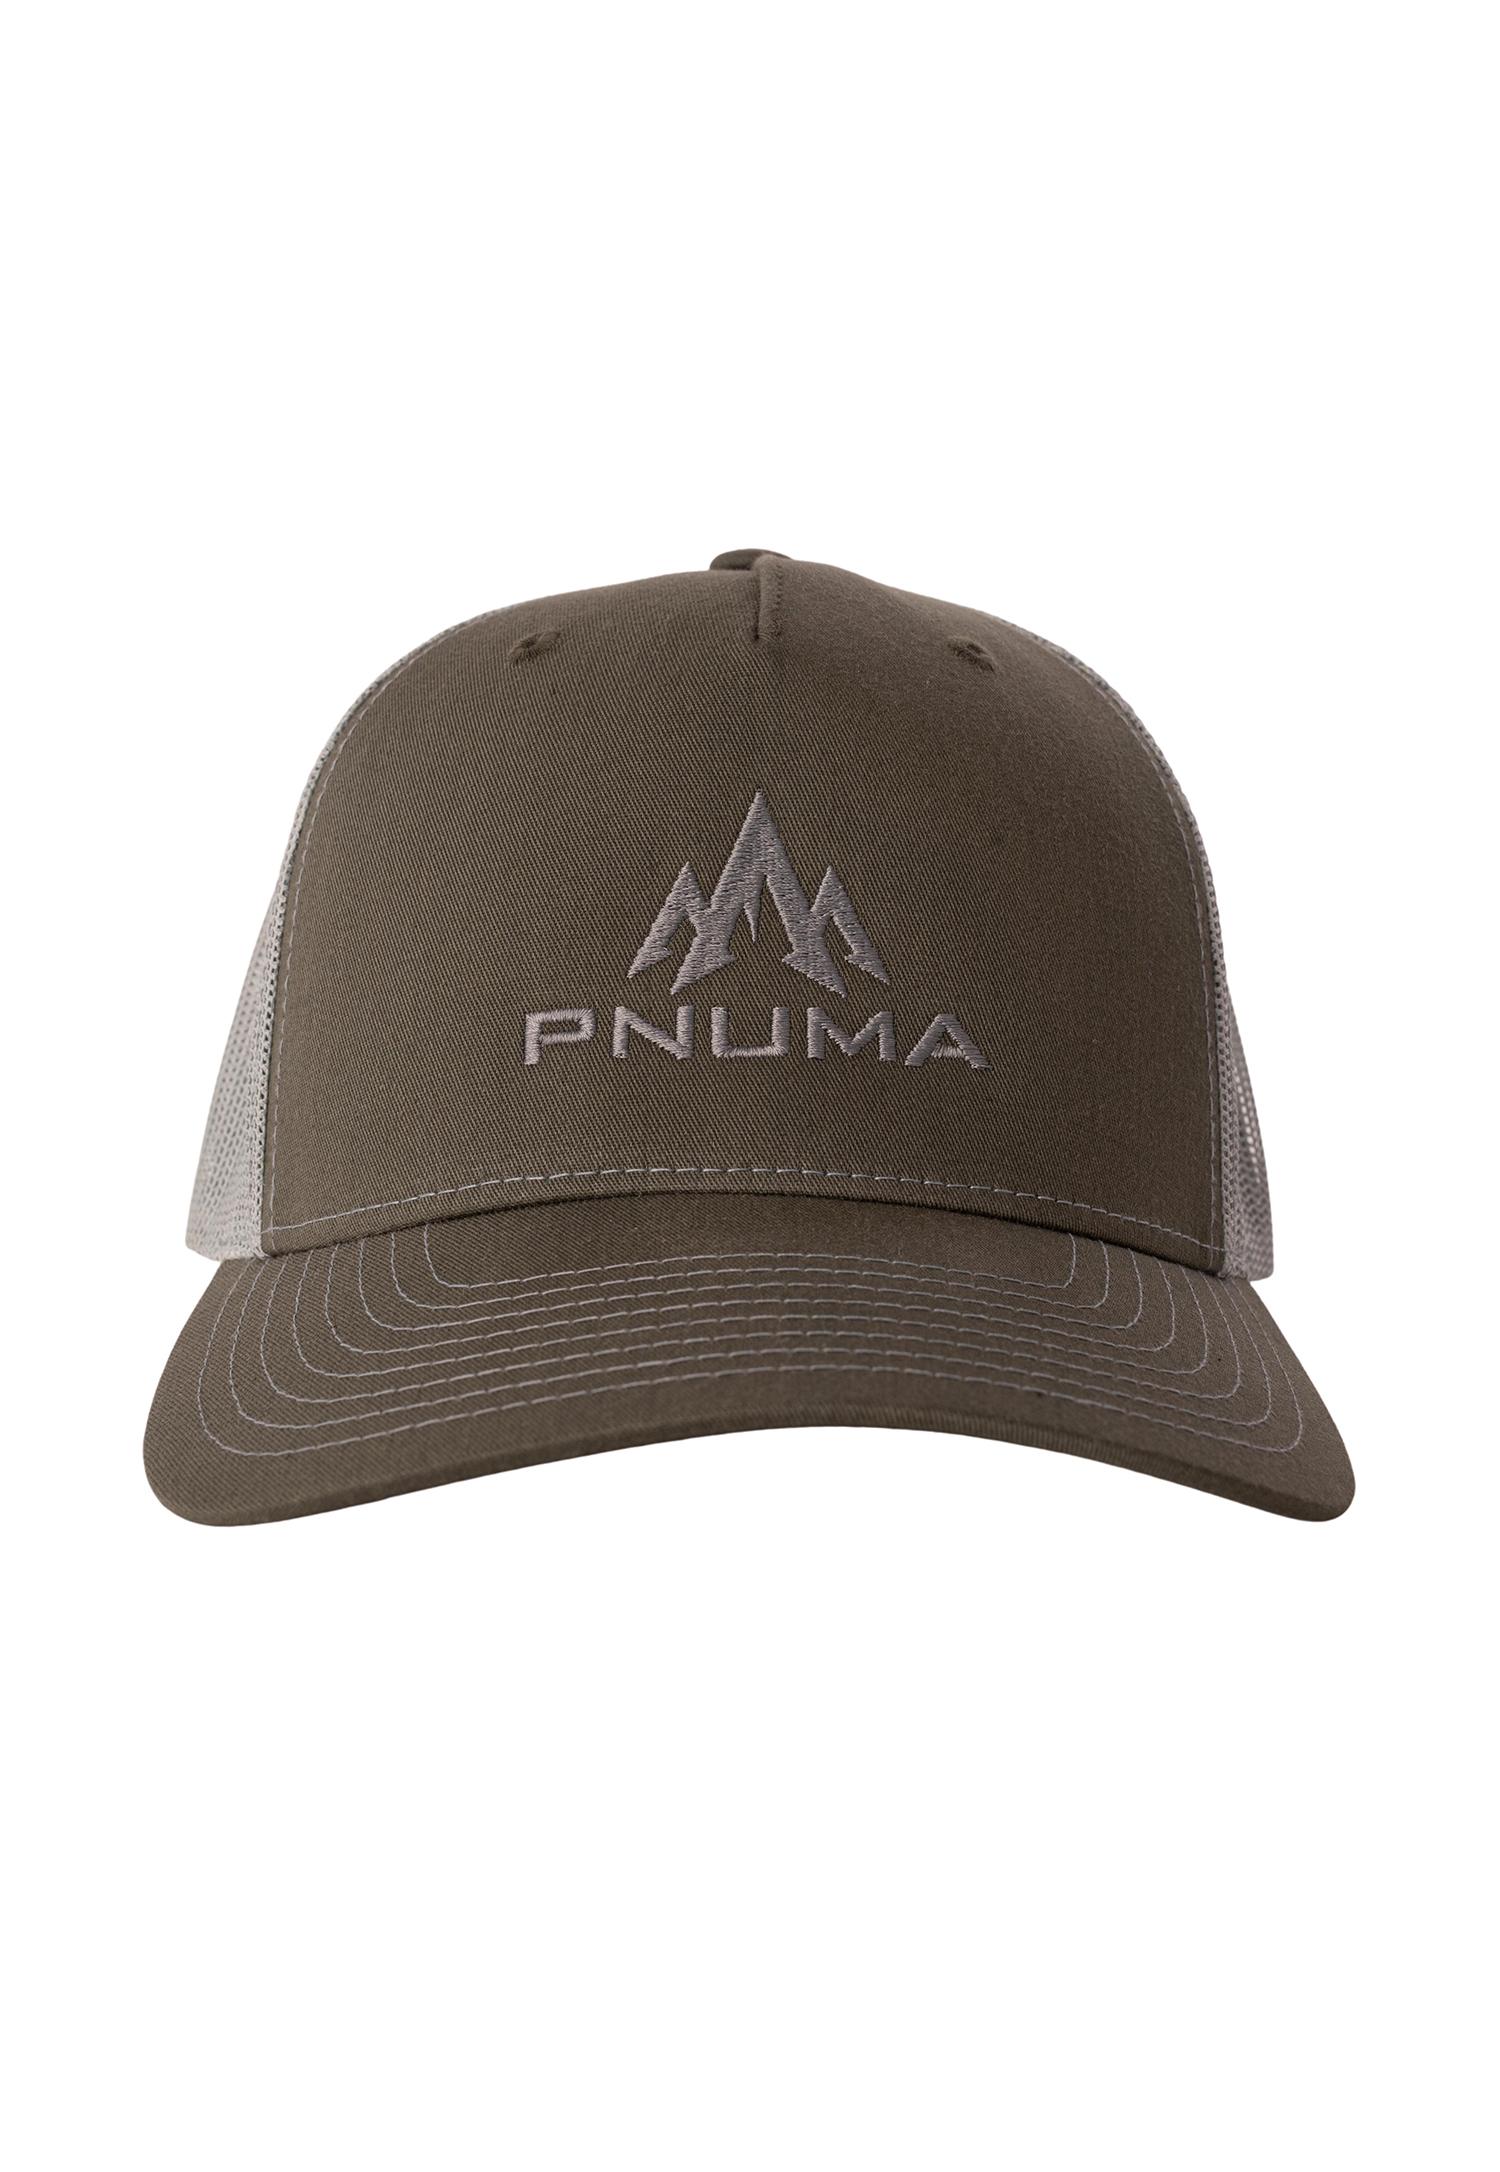 Pnuma 5 Panel Trucker Cap